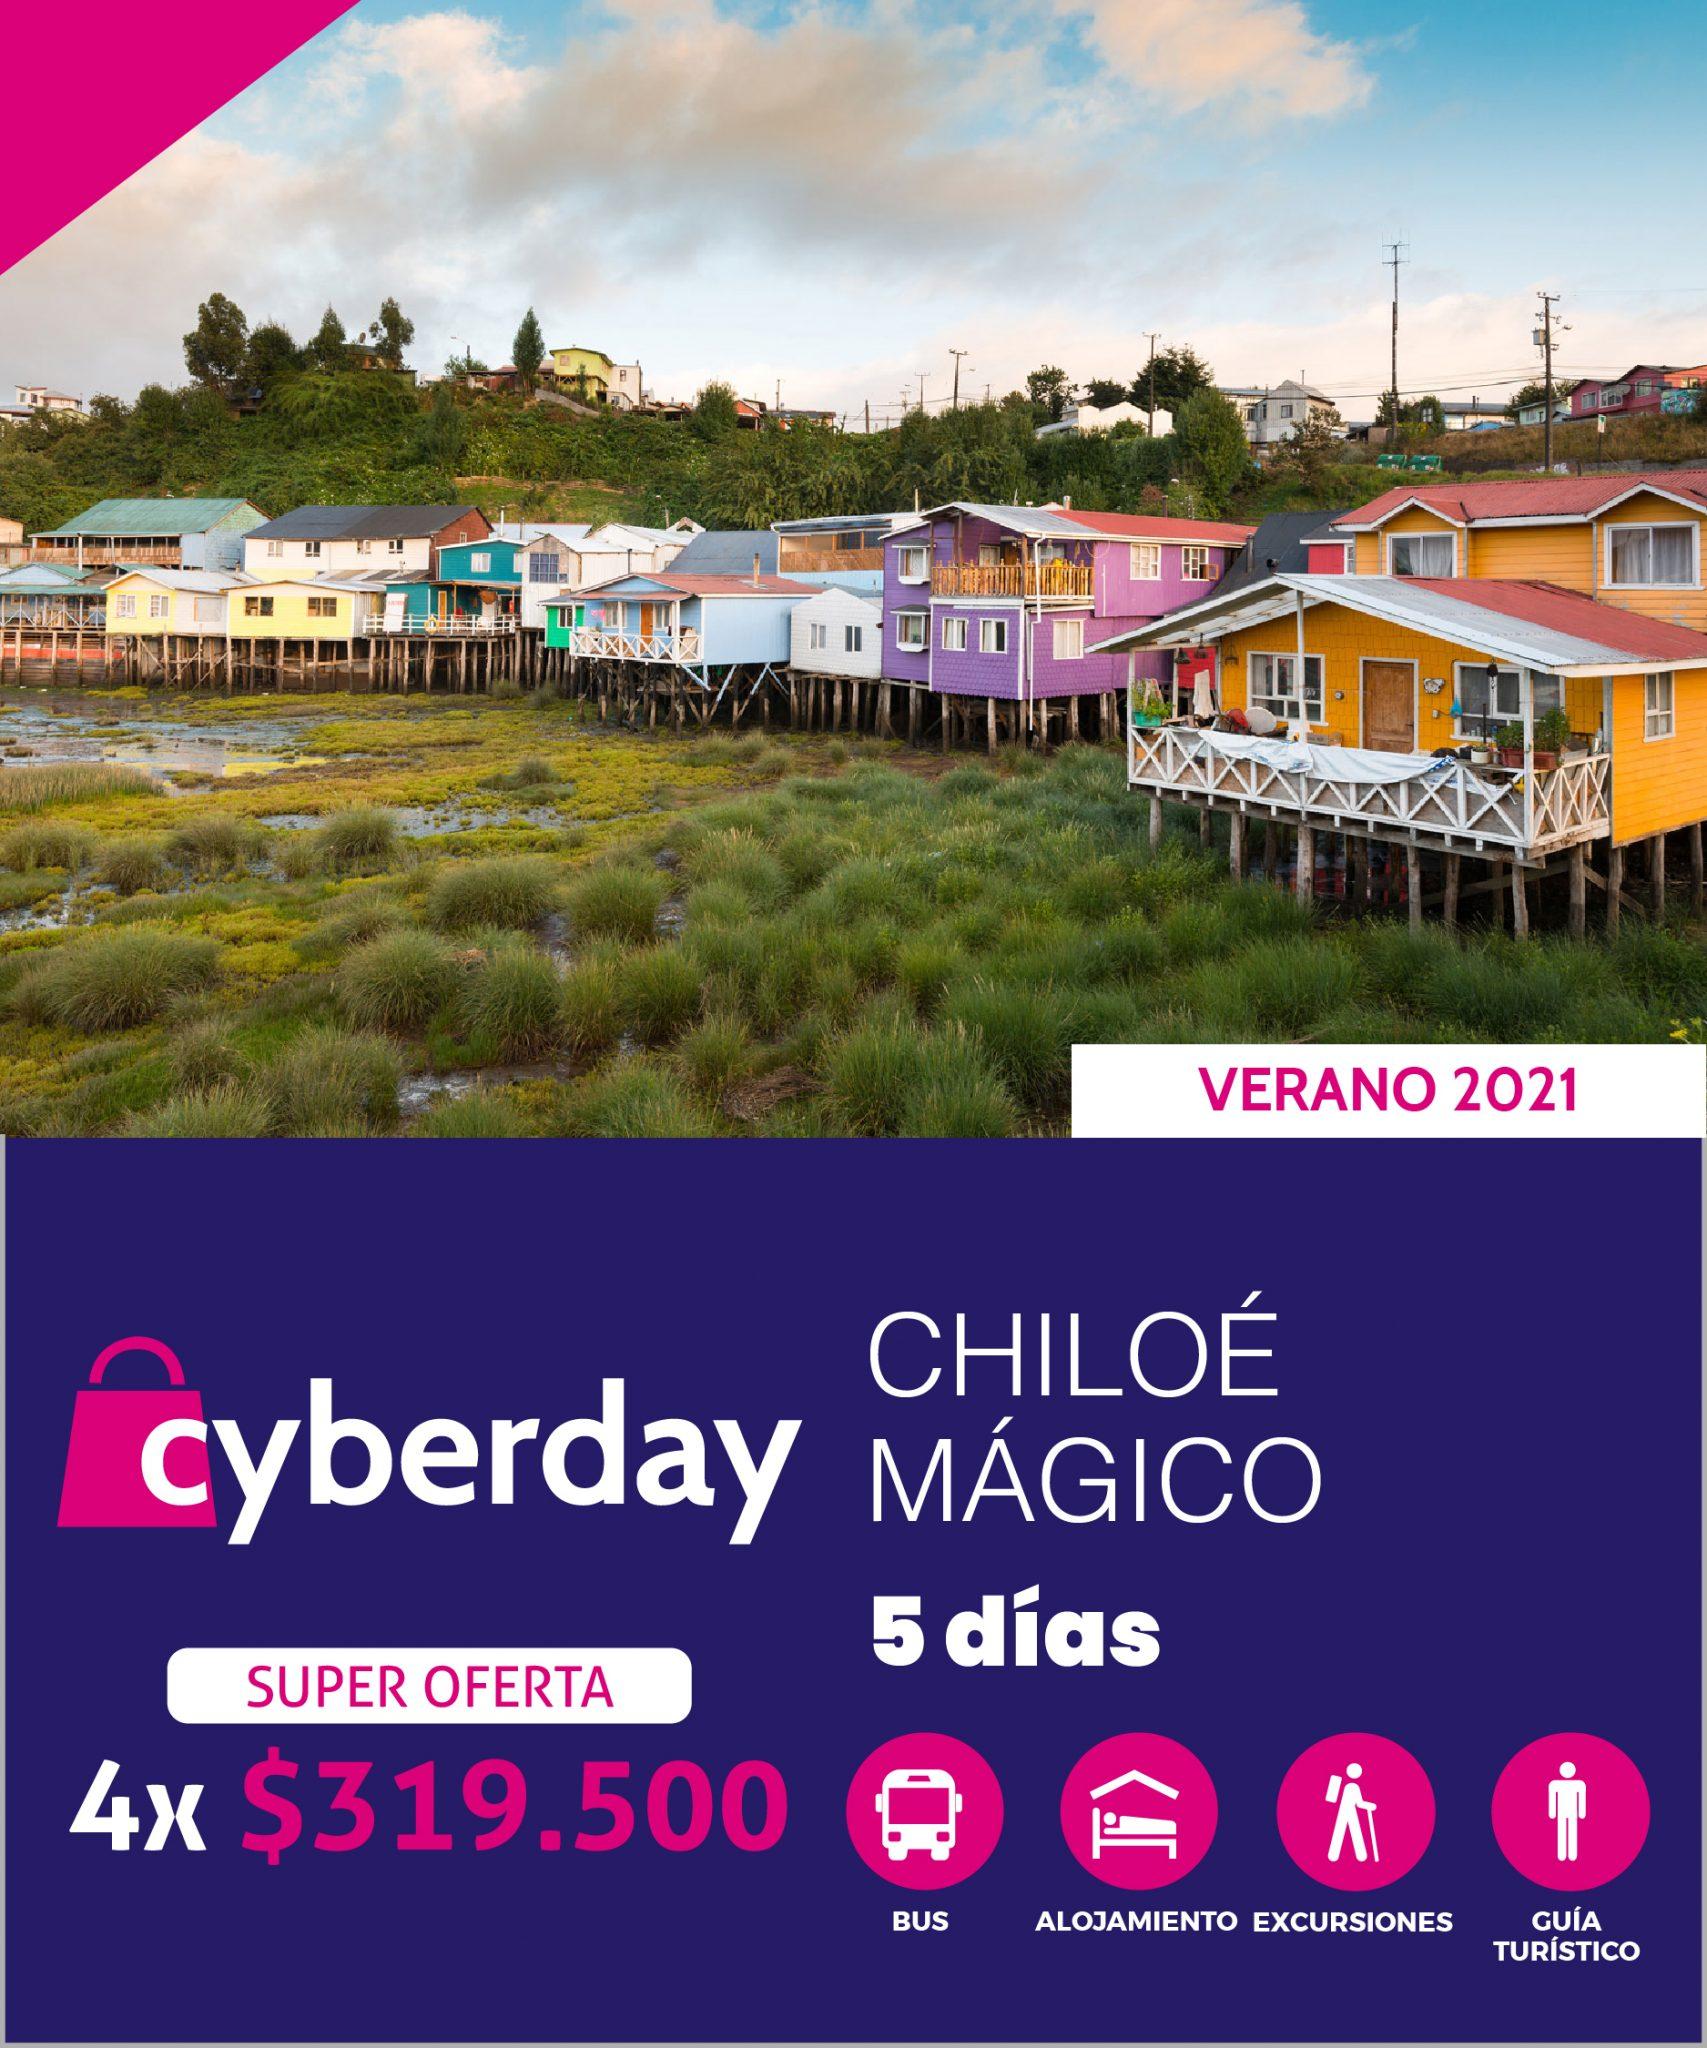 CHILOÉ MÁGICO